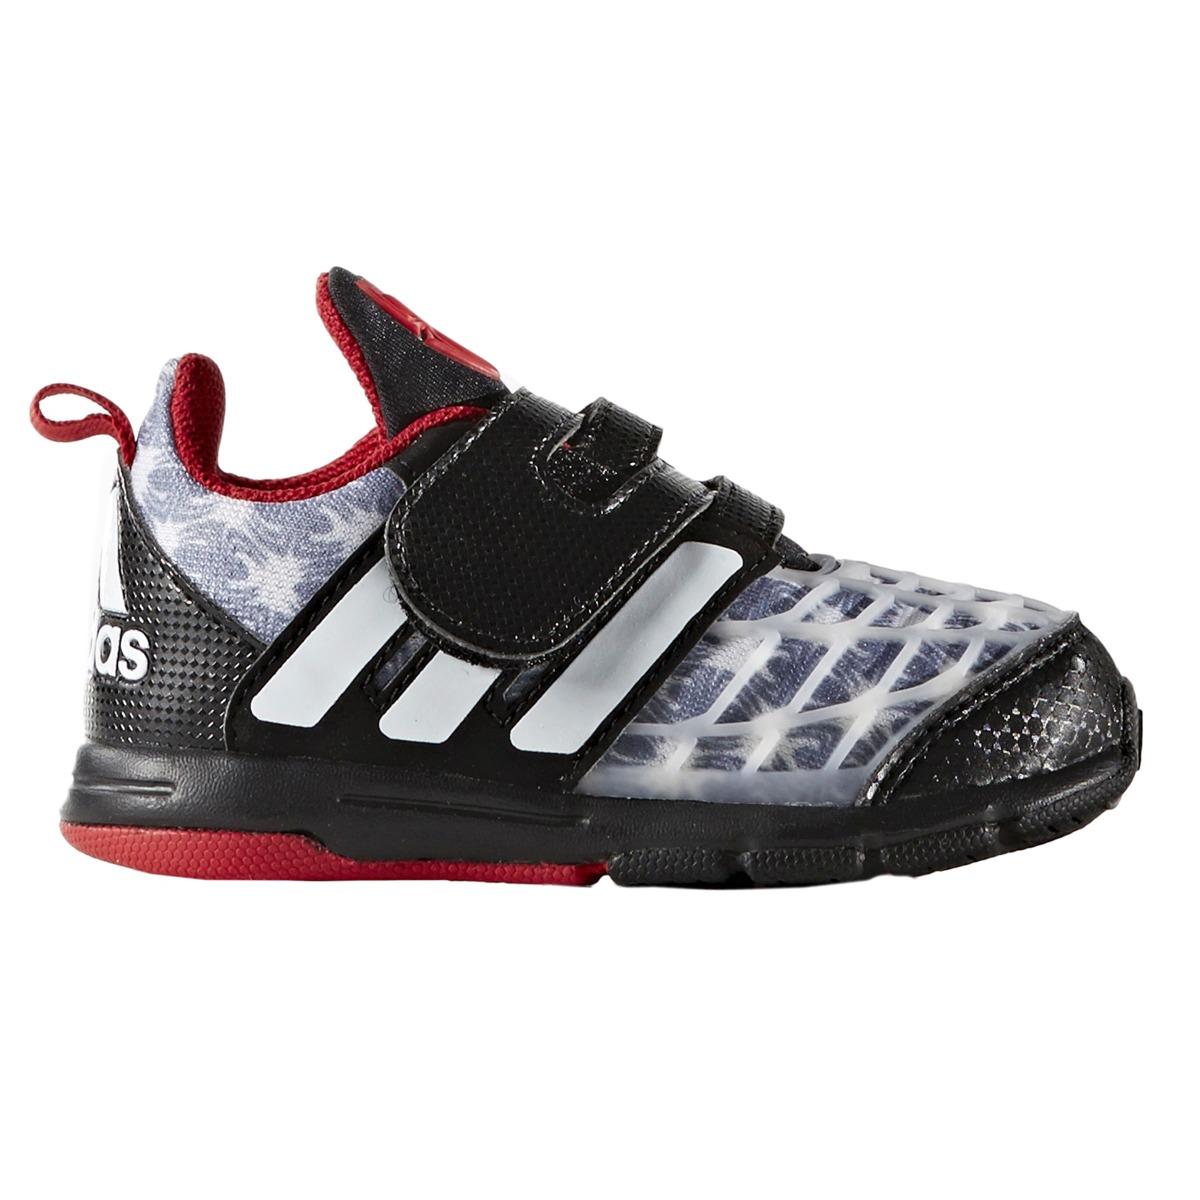 Zapatillas adidas Marvel Spider man Cf I Sportline